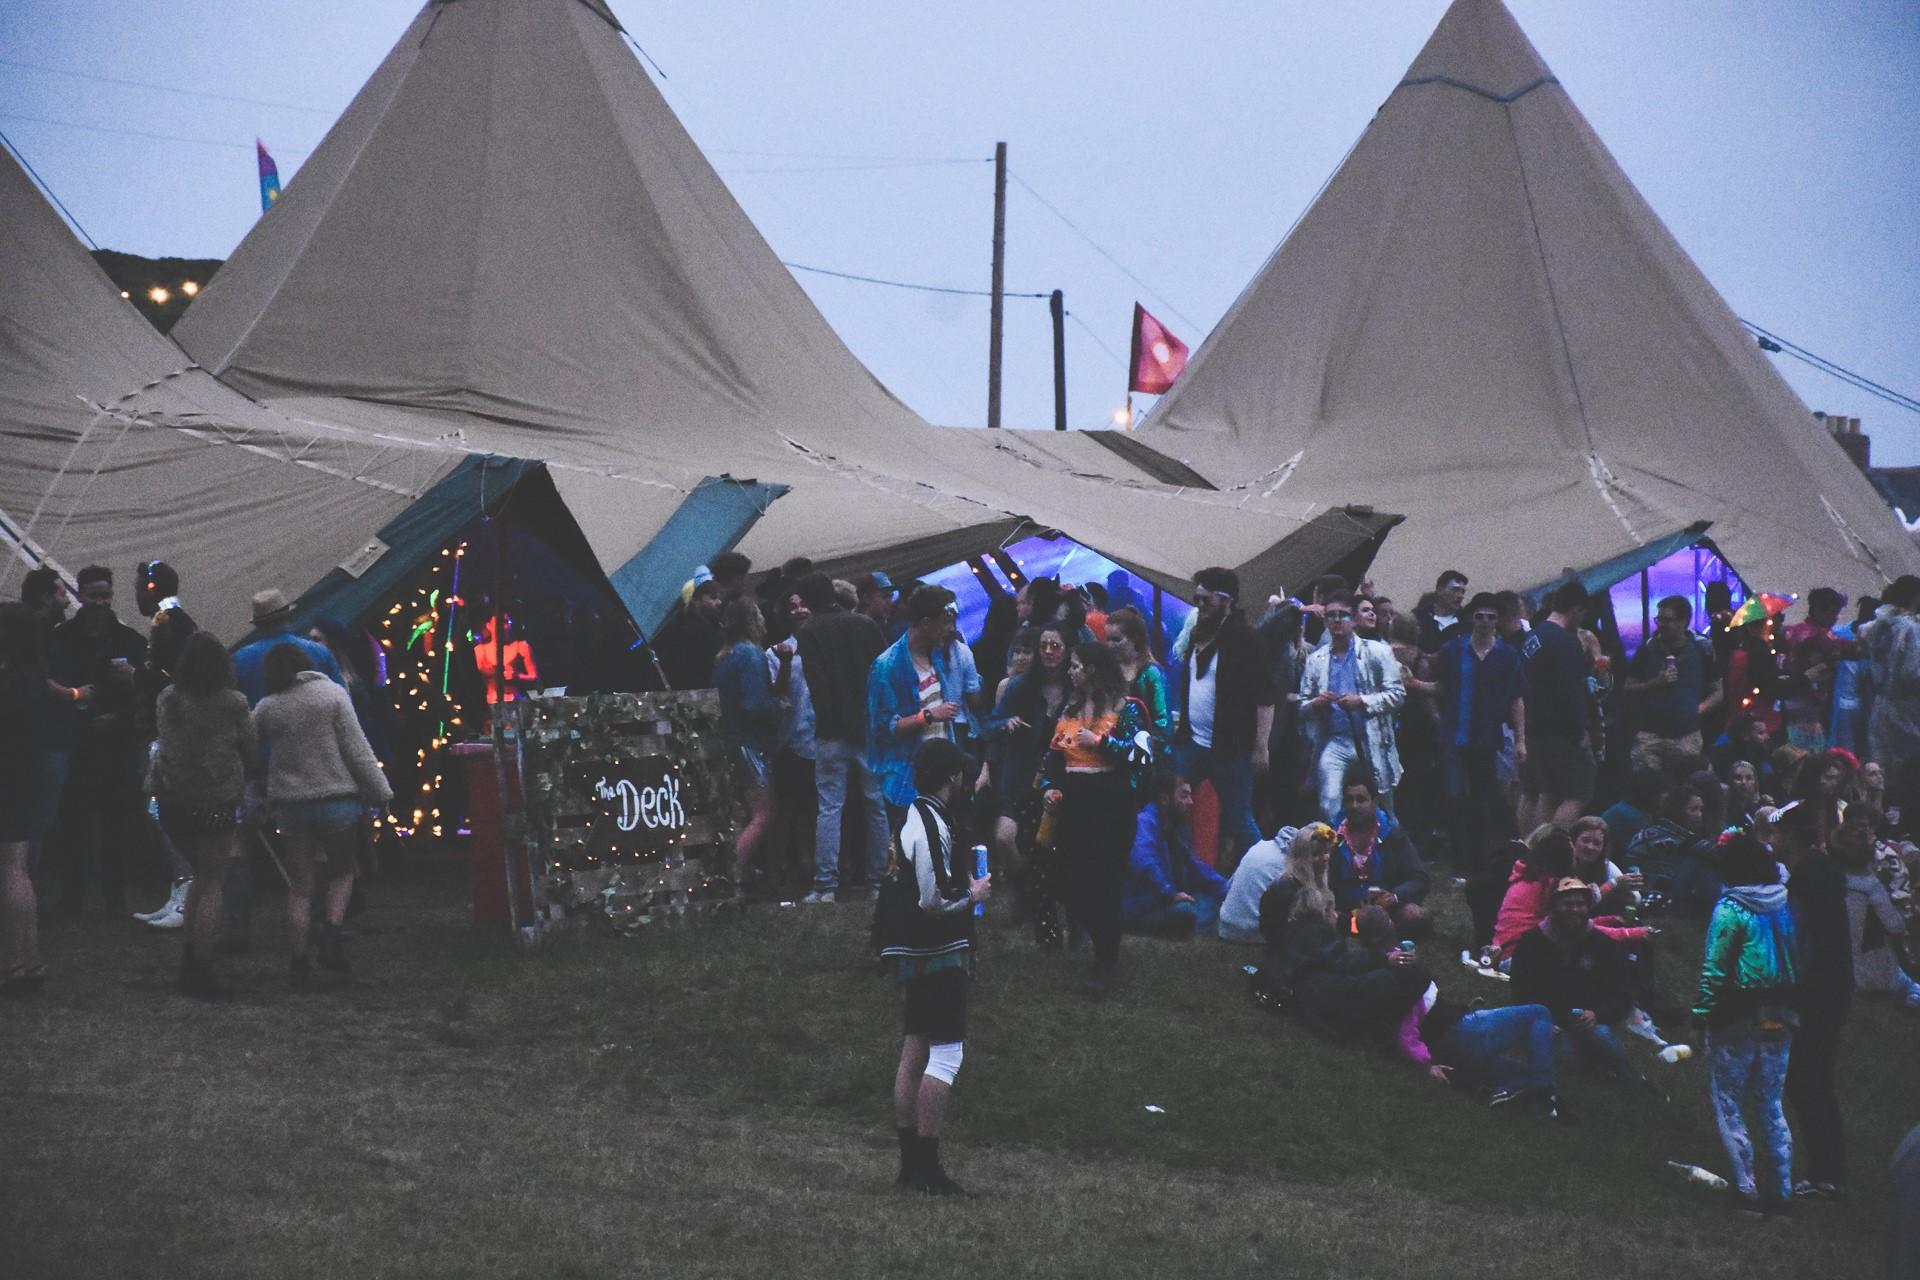 festival tipi